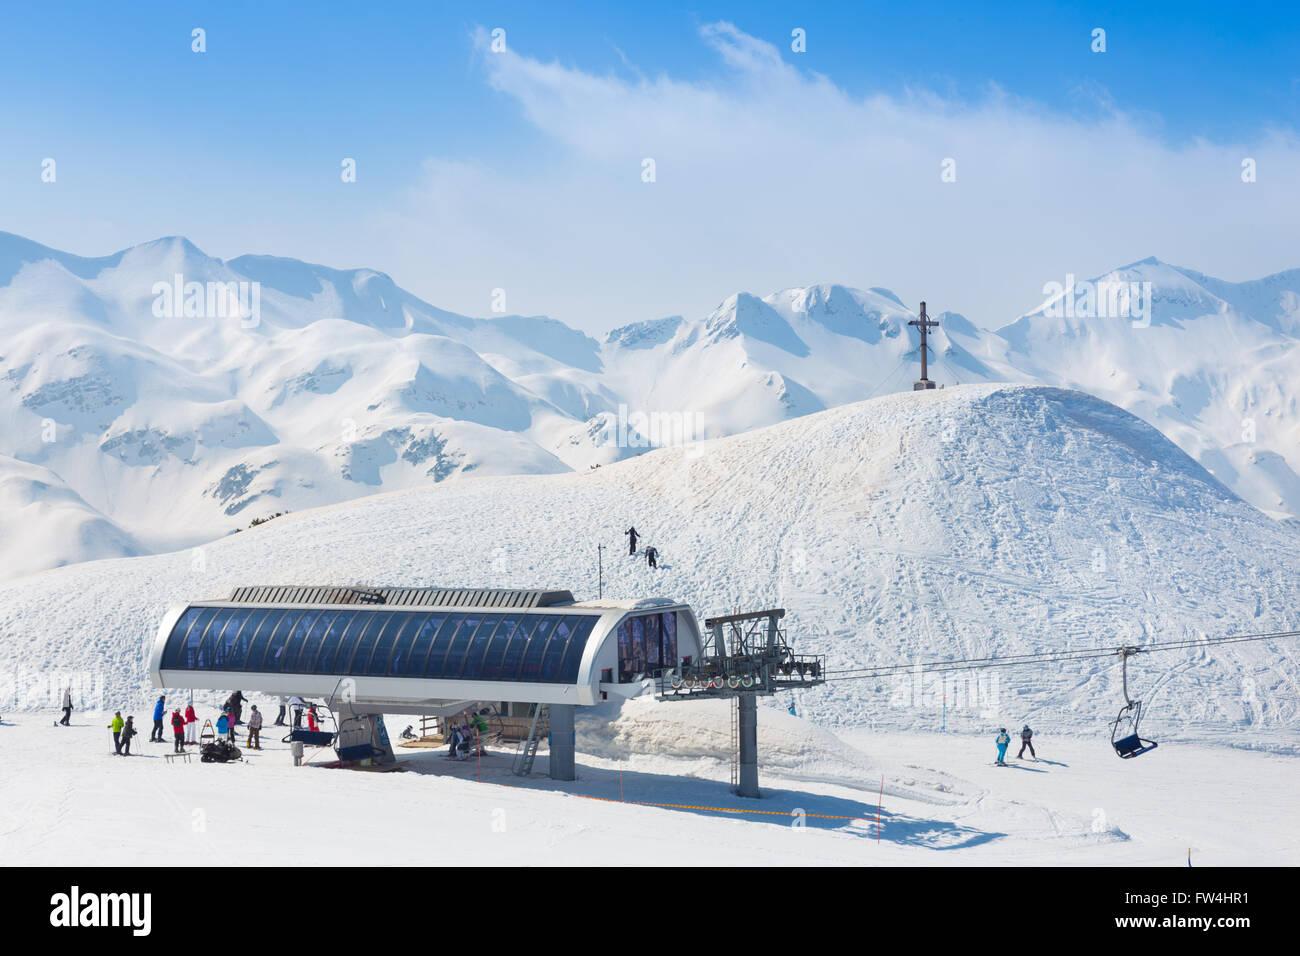 Vogel, Alps, Slovenia, Europe. - Stock Image